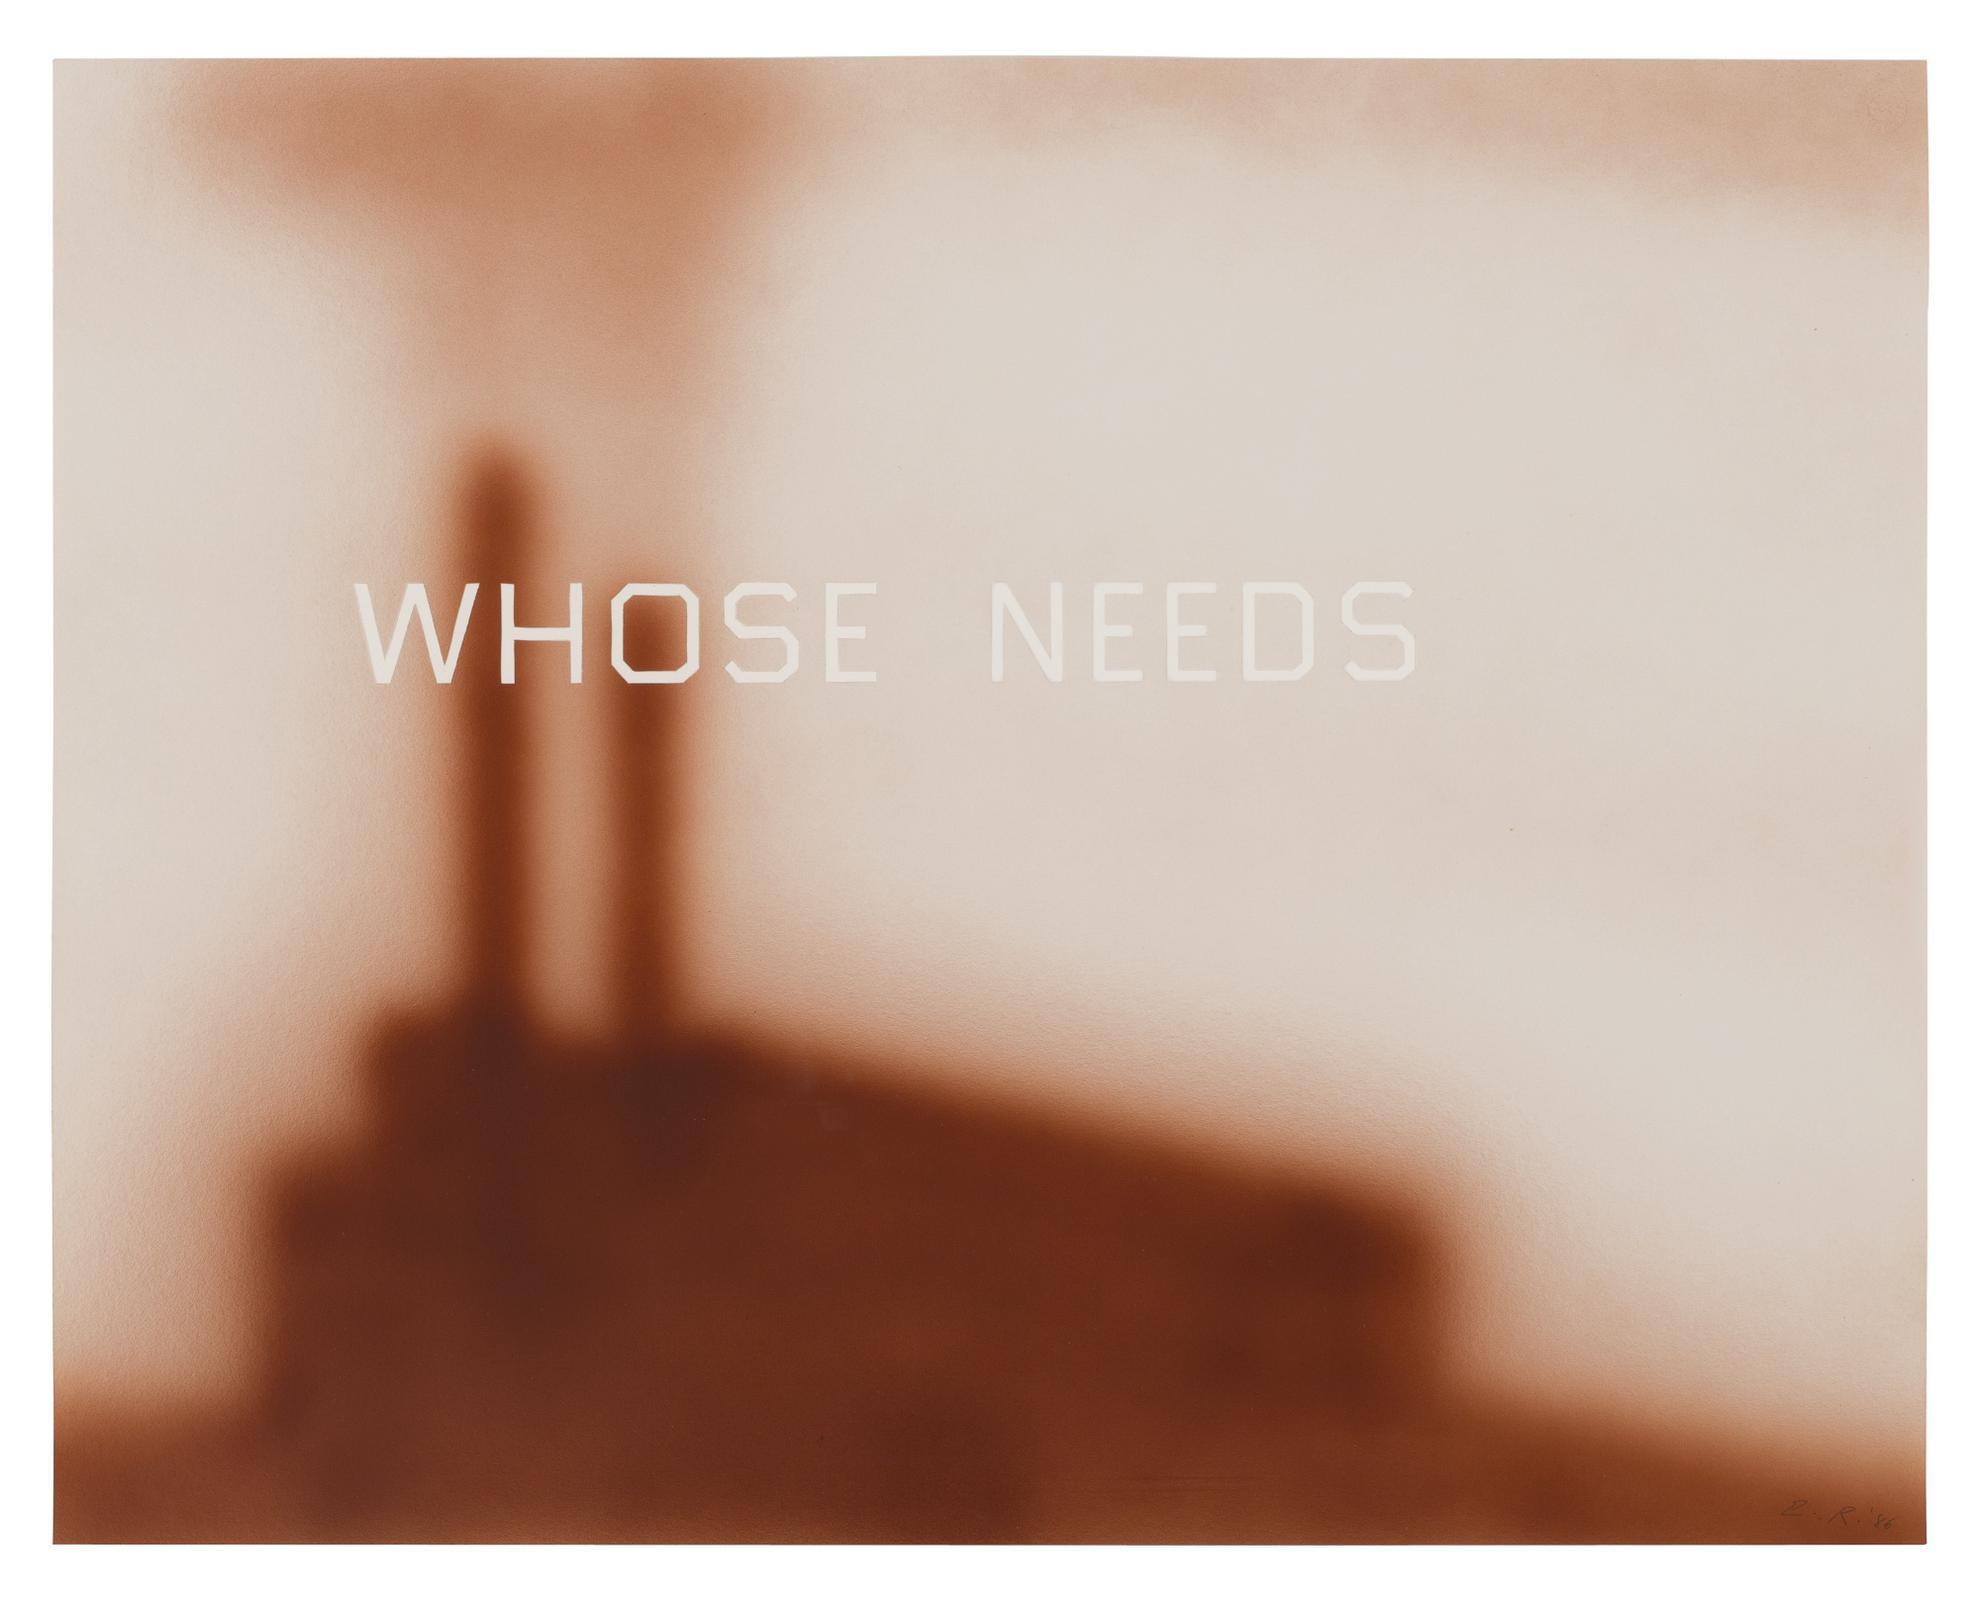 Ed Ruscha-Whose Needs-1986